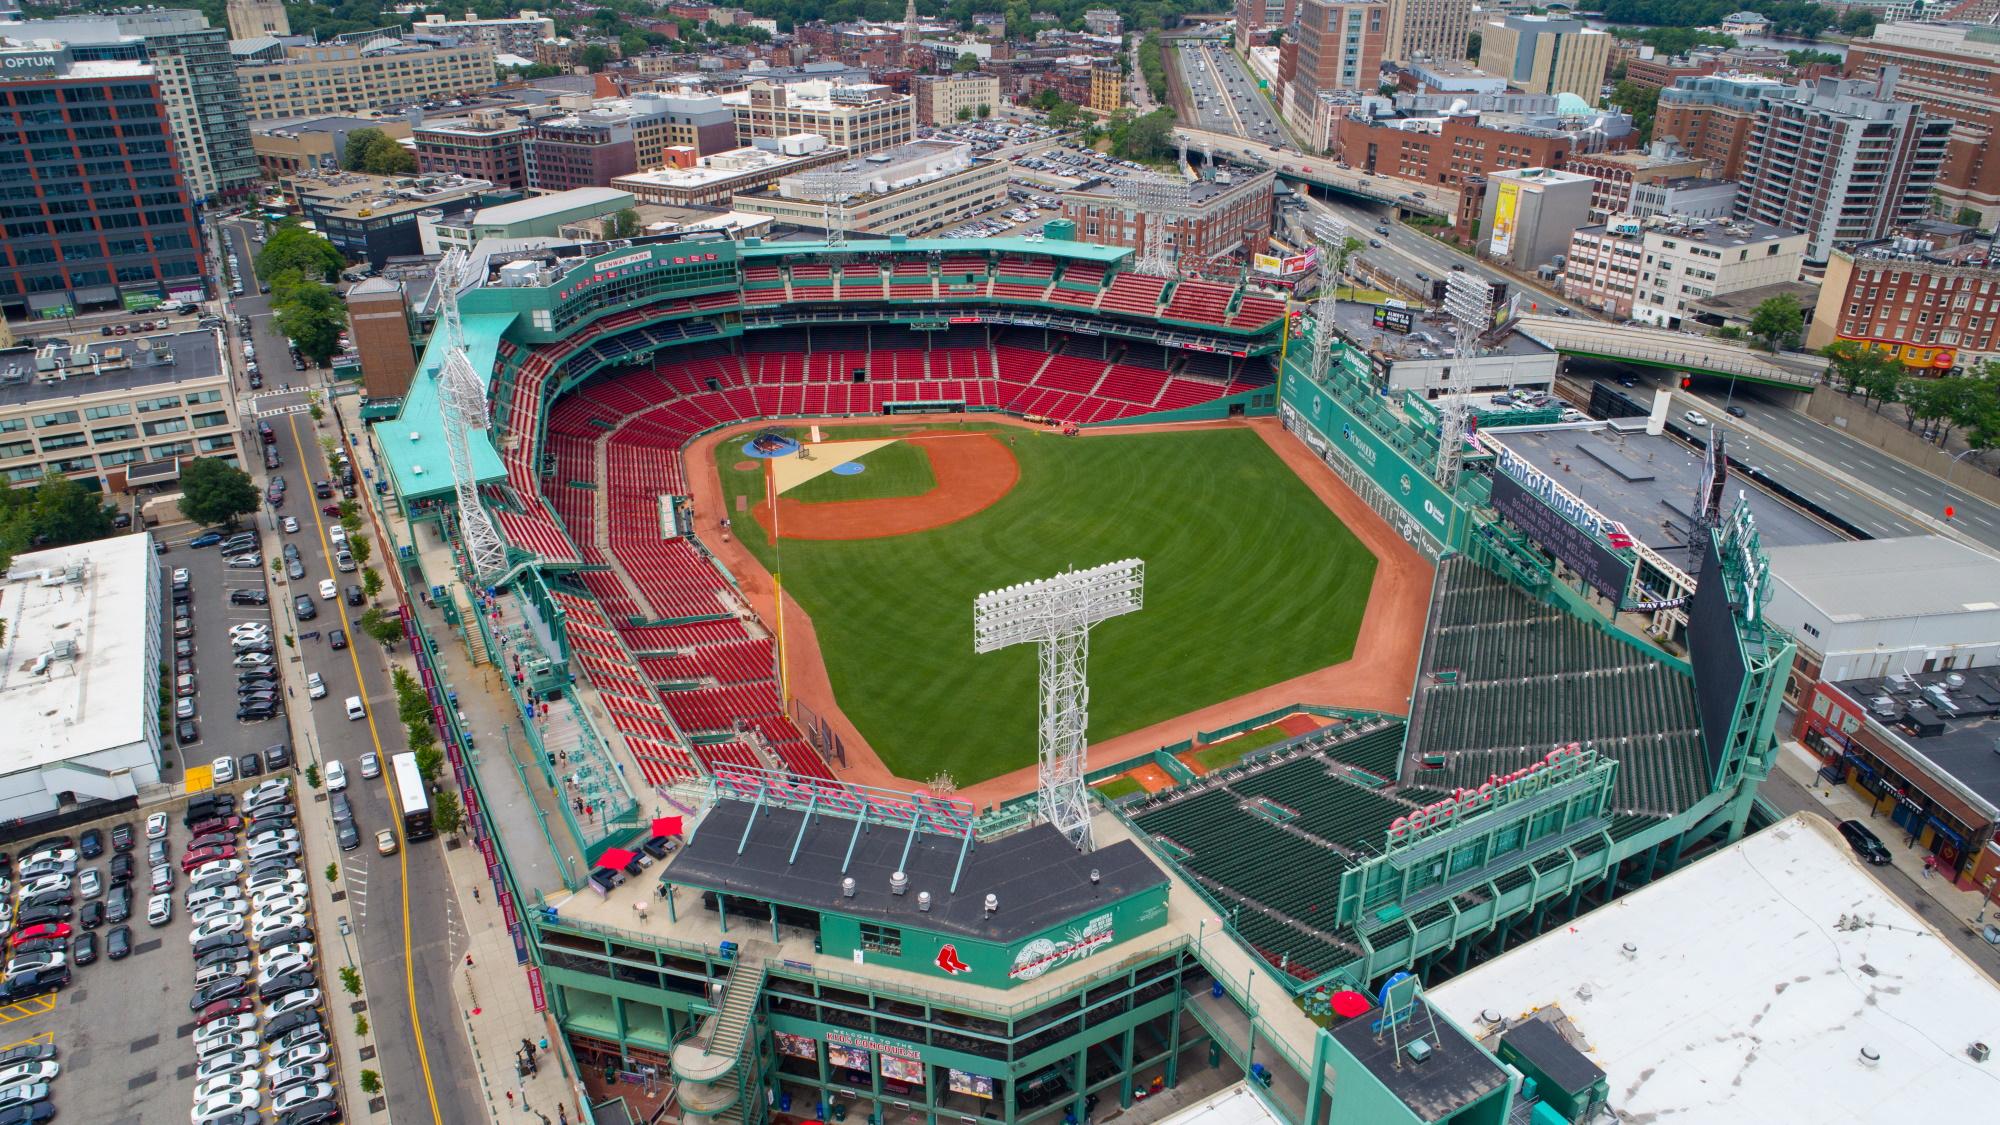 Fenway Park - home of the Boston Red Sox MLB baseball team